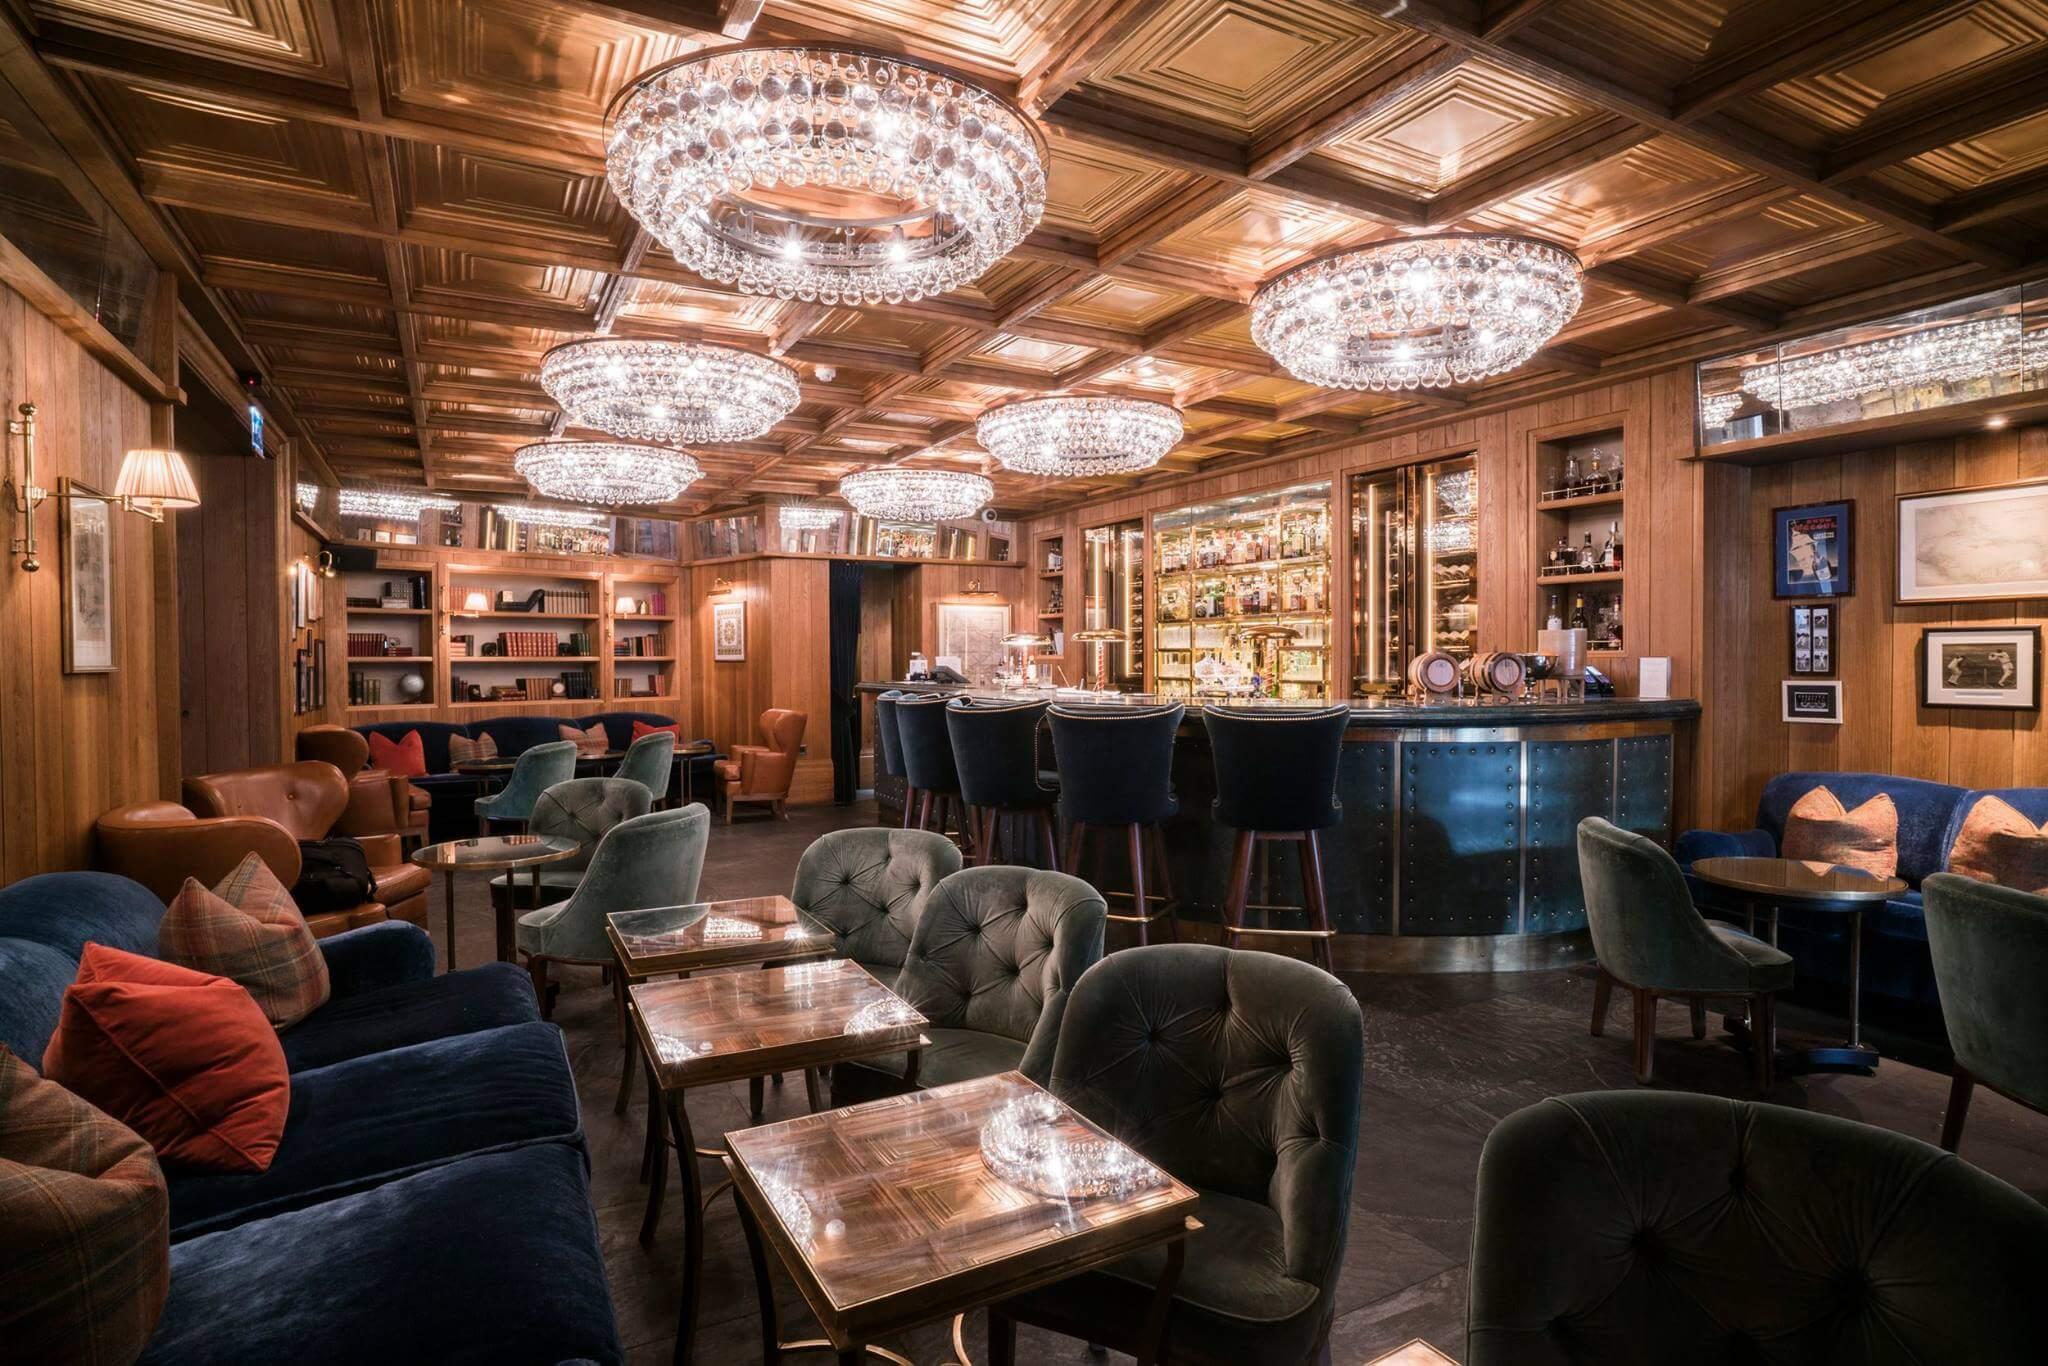 The Kensington Hotel Review